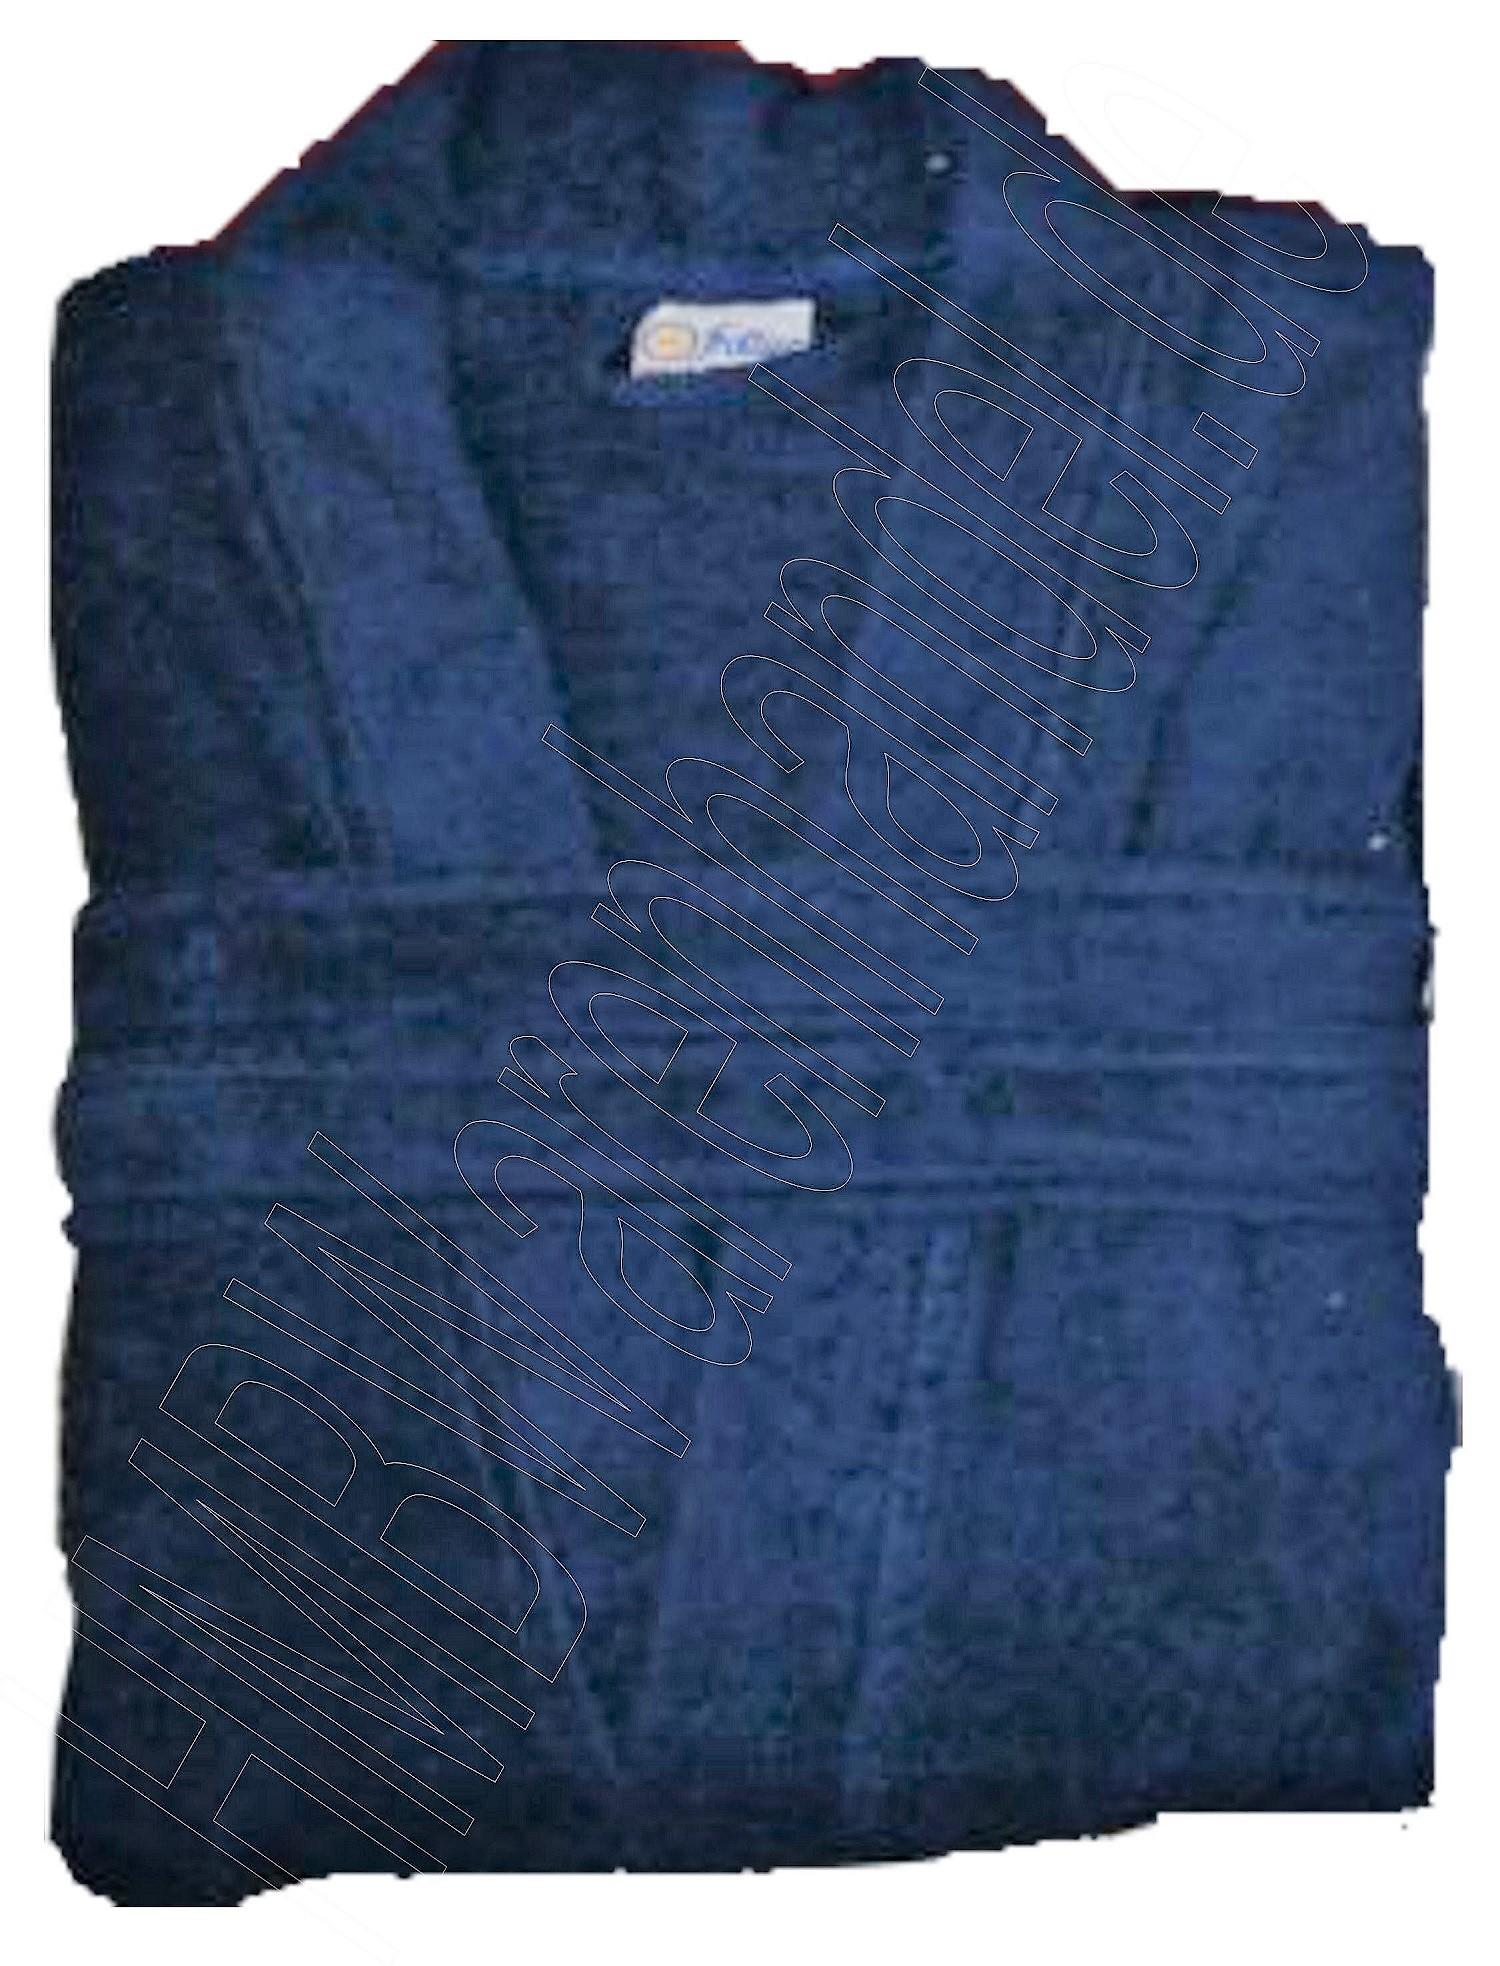 damen herren baumwolle frottier bademantel saunamantel schalkragen blau s kotex ebay. Black Bedroom Furniture Sets. Home Design Ideas